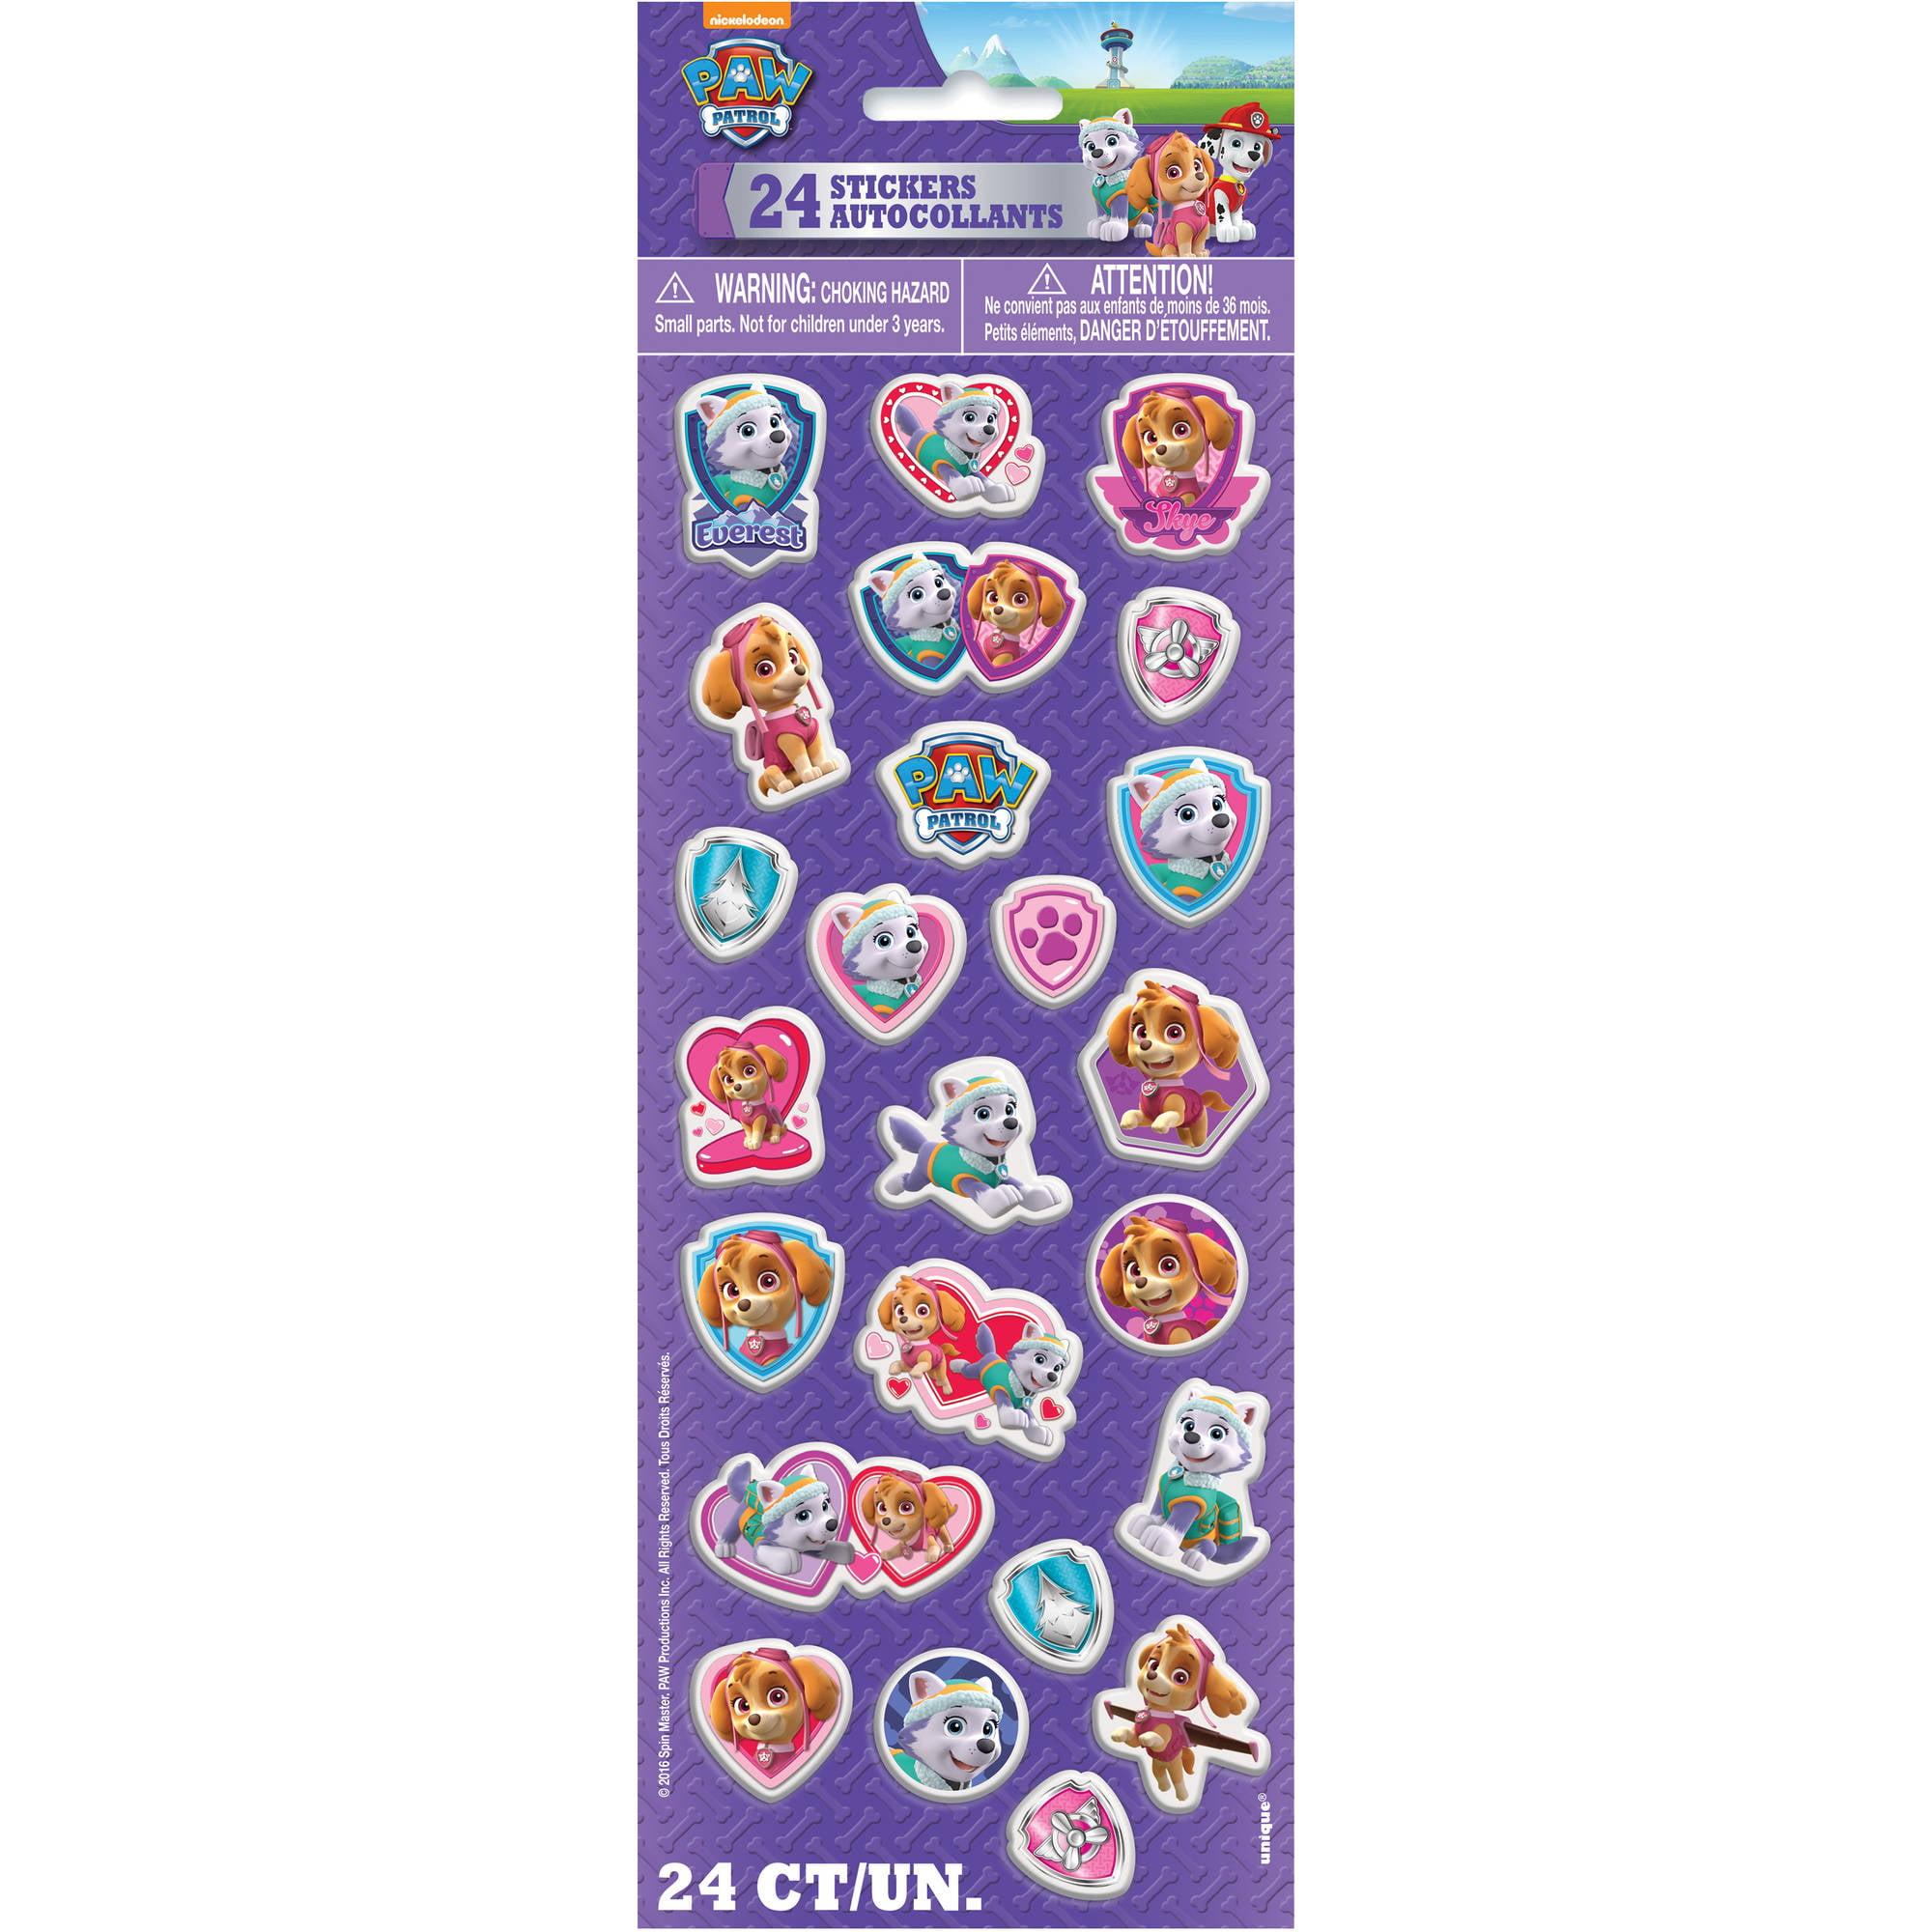 Skye PAW Patrol Puffy Sticker Sheet, 1ct